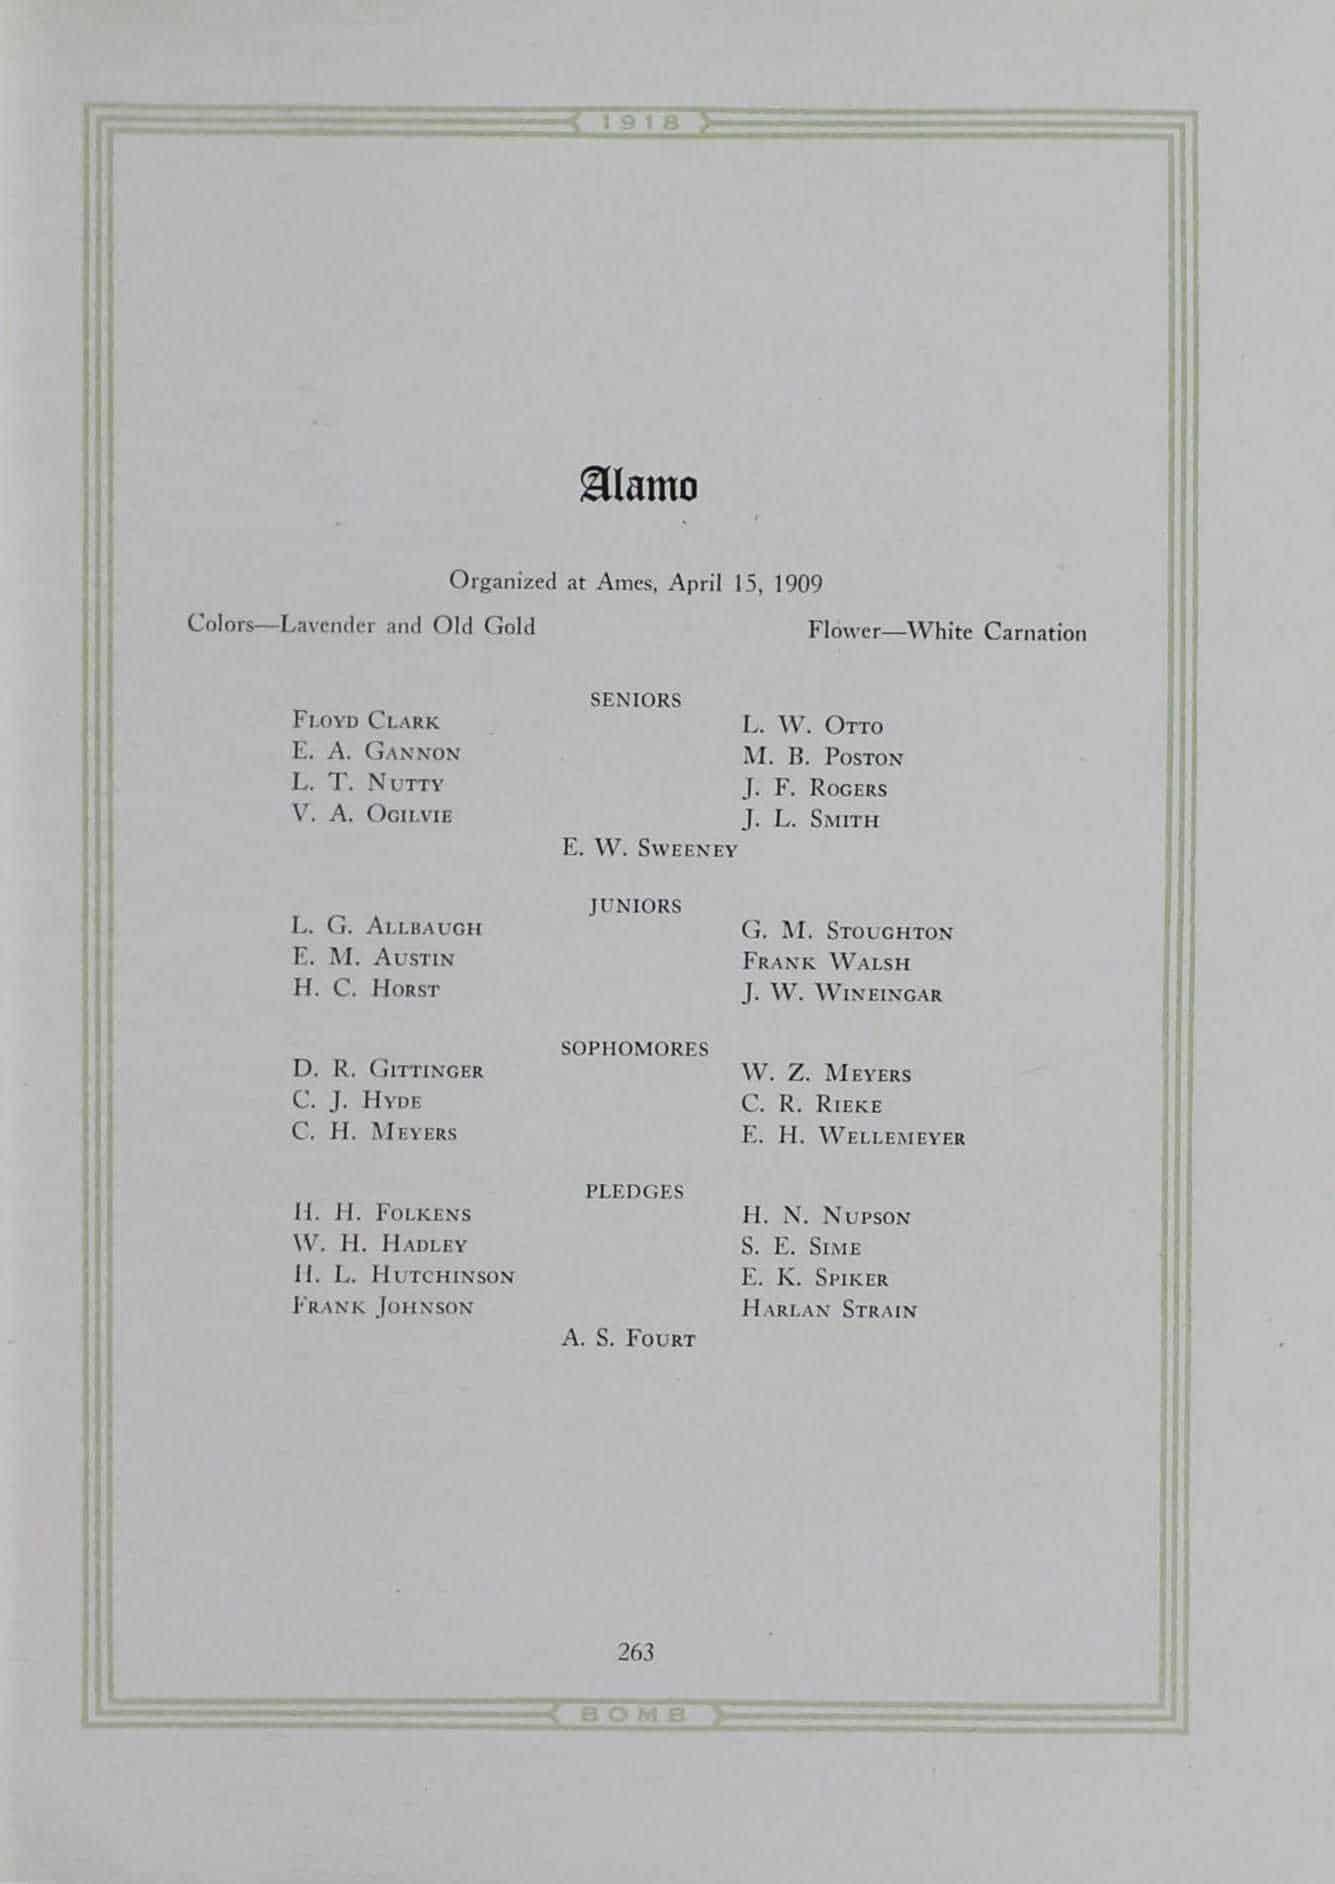 1917 Alamo Club Roster